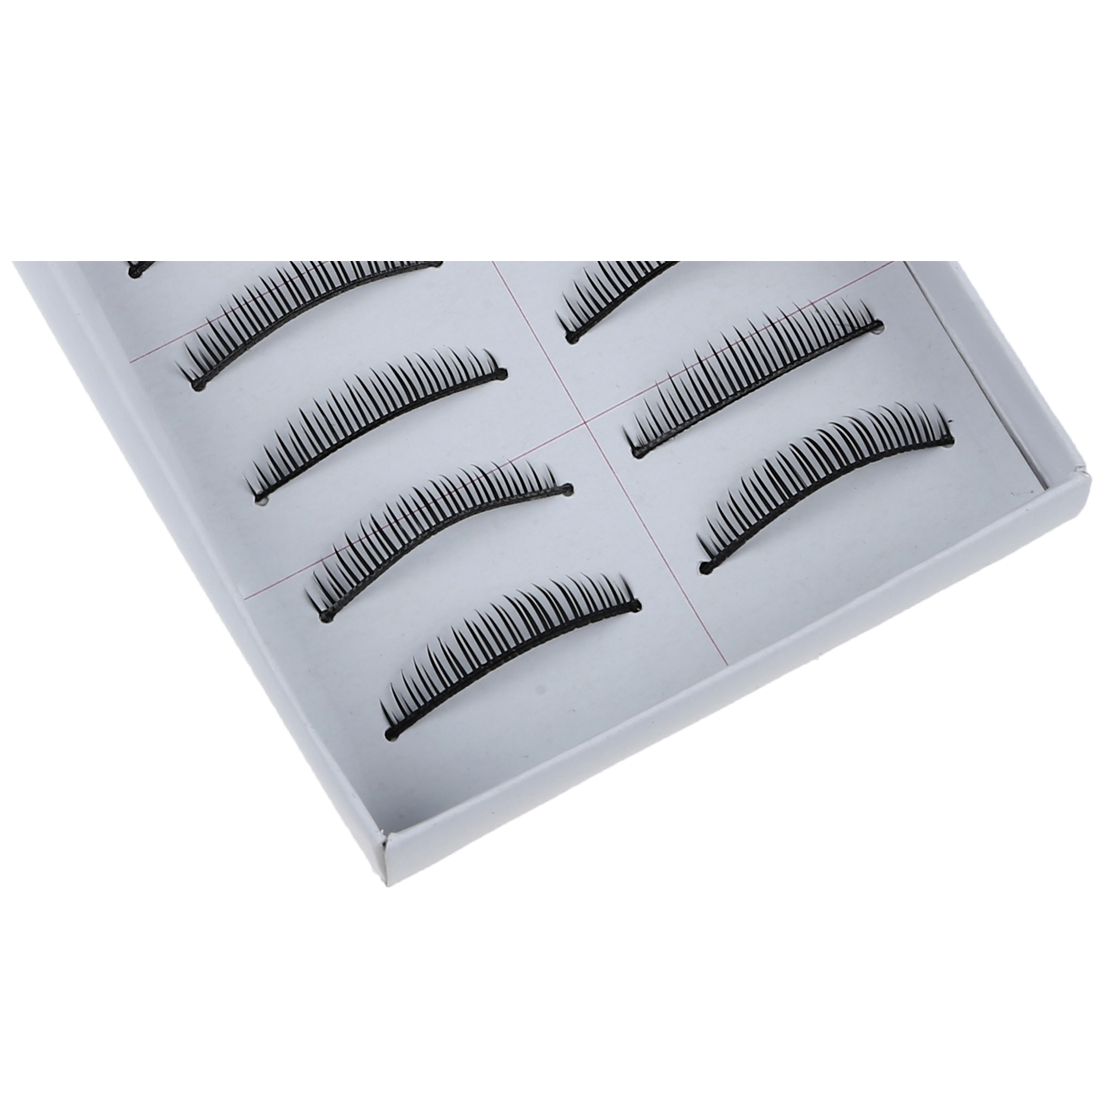 SS1 10 Pairs Fabulous Natural-Looking False Eyelashes Eye Lashs ...